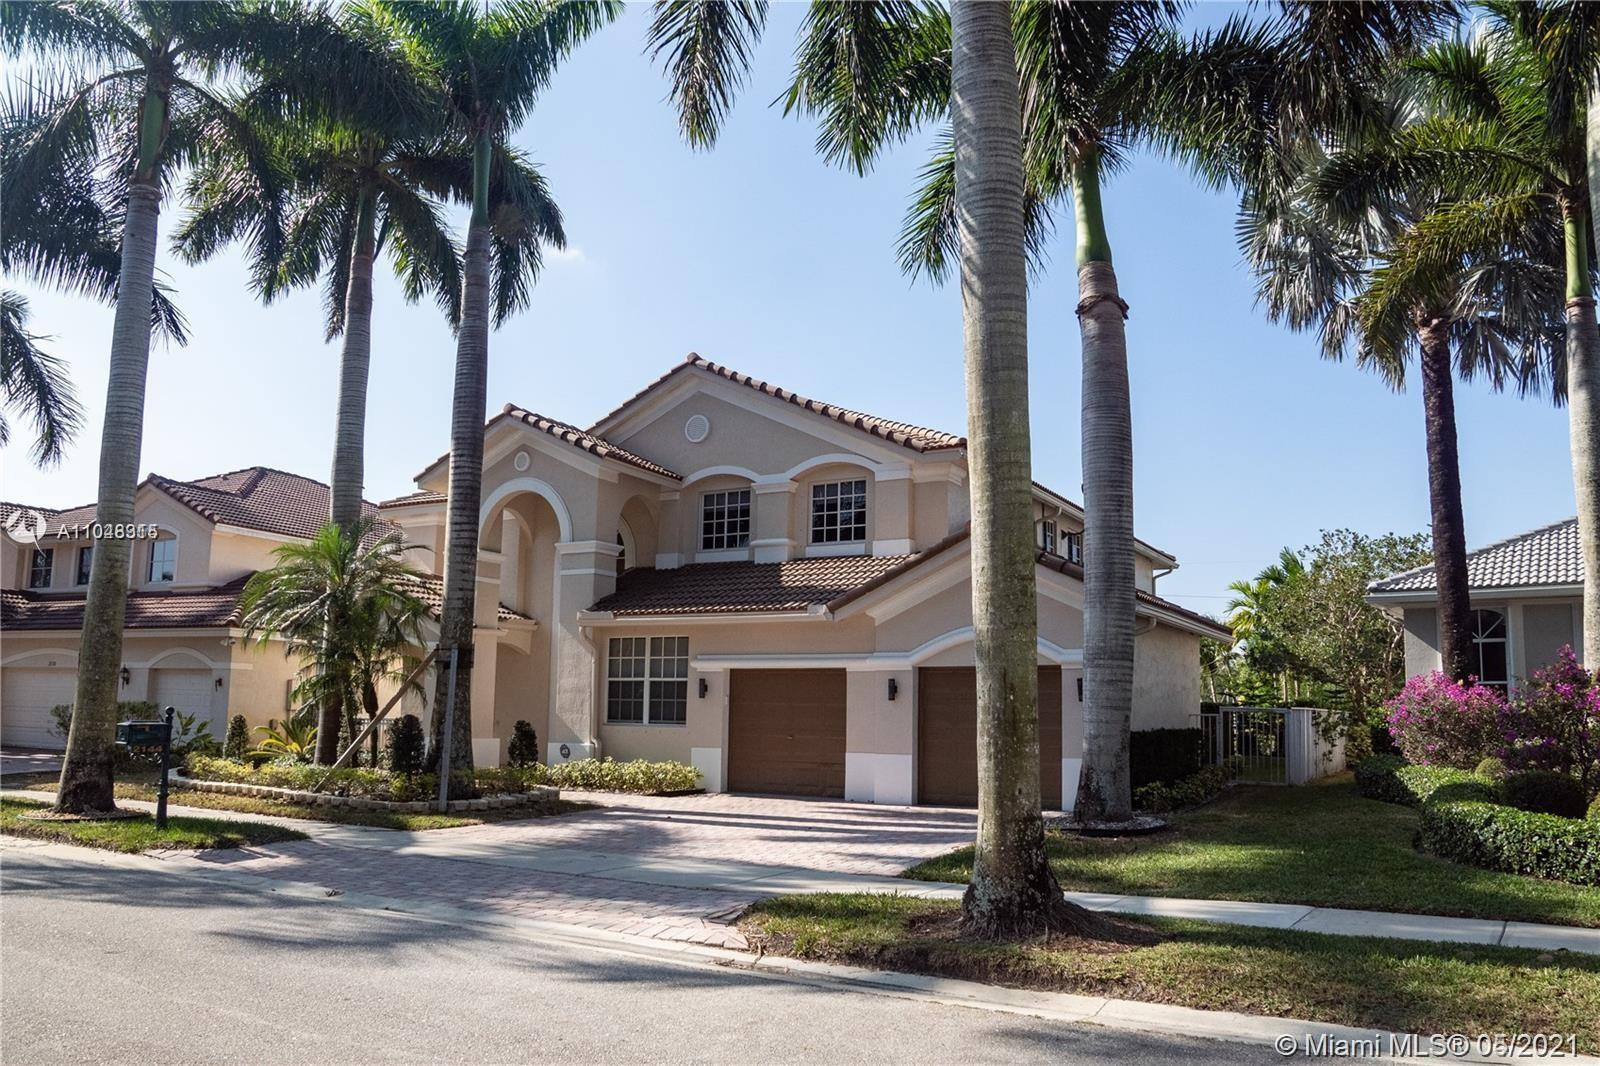 Weston Hills - 2144 Quail Roost Dr, Weston, FL 33327